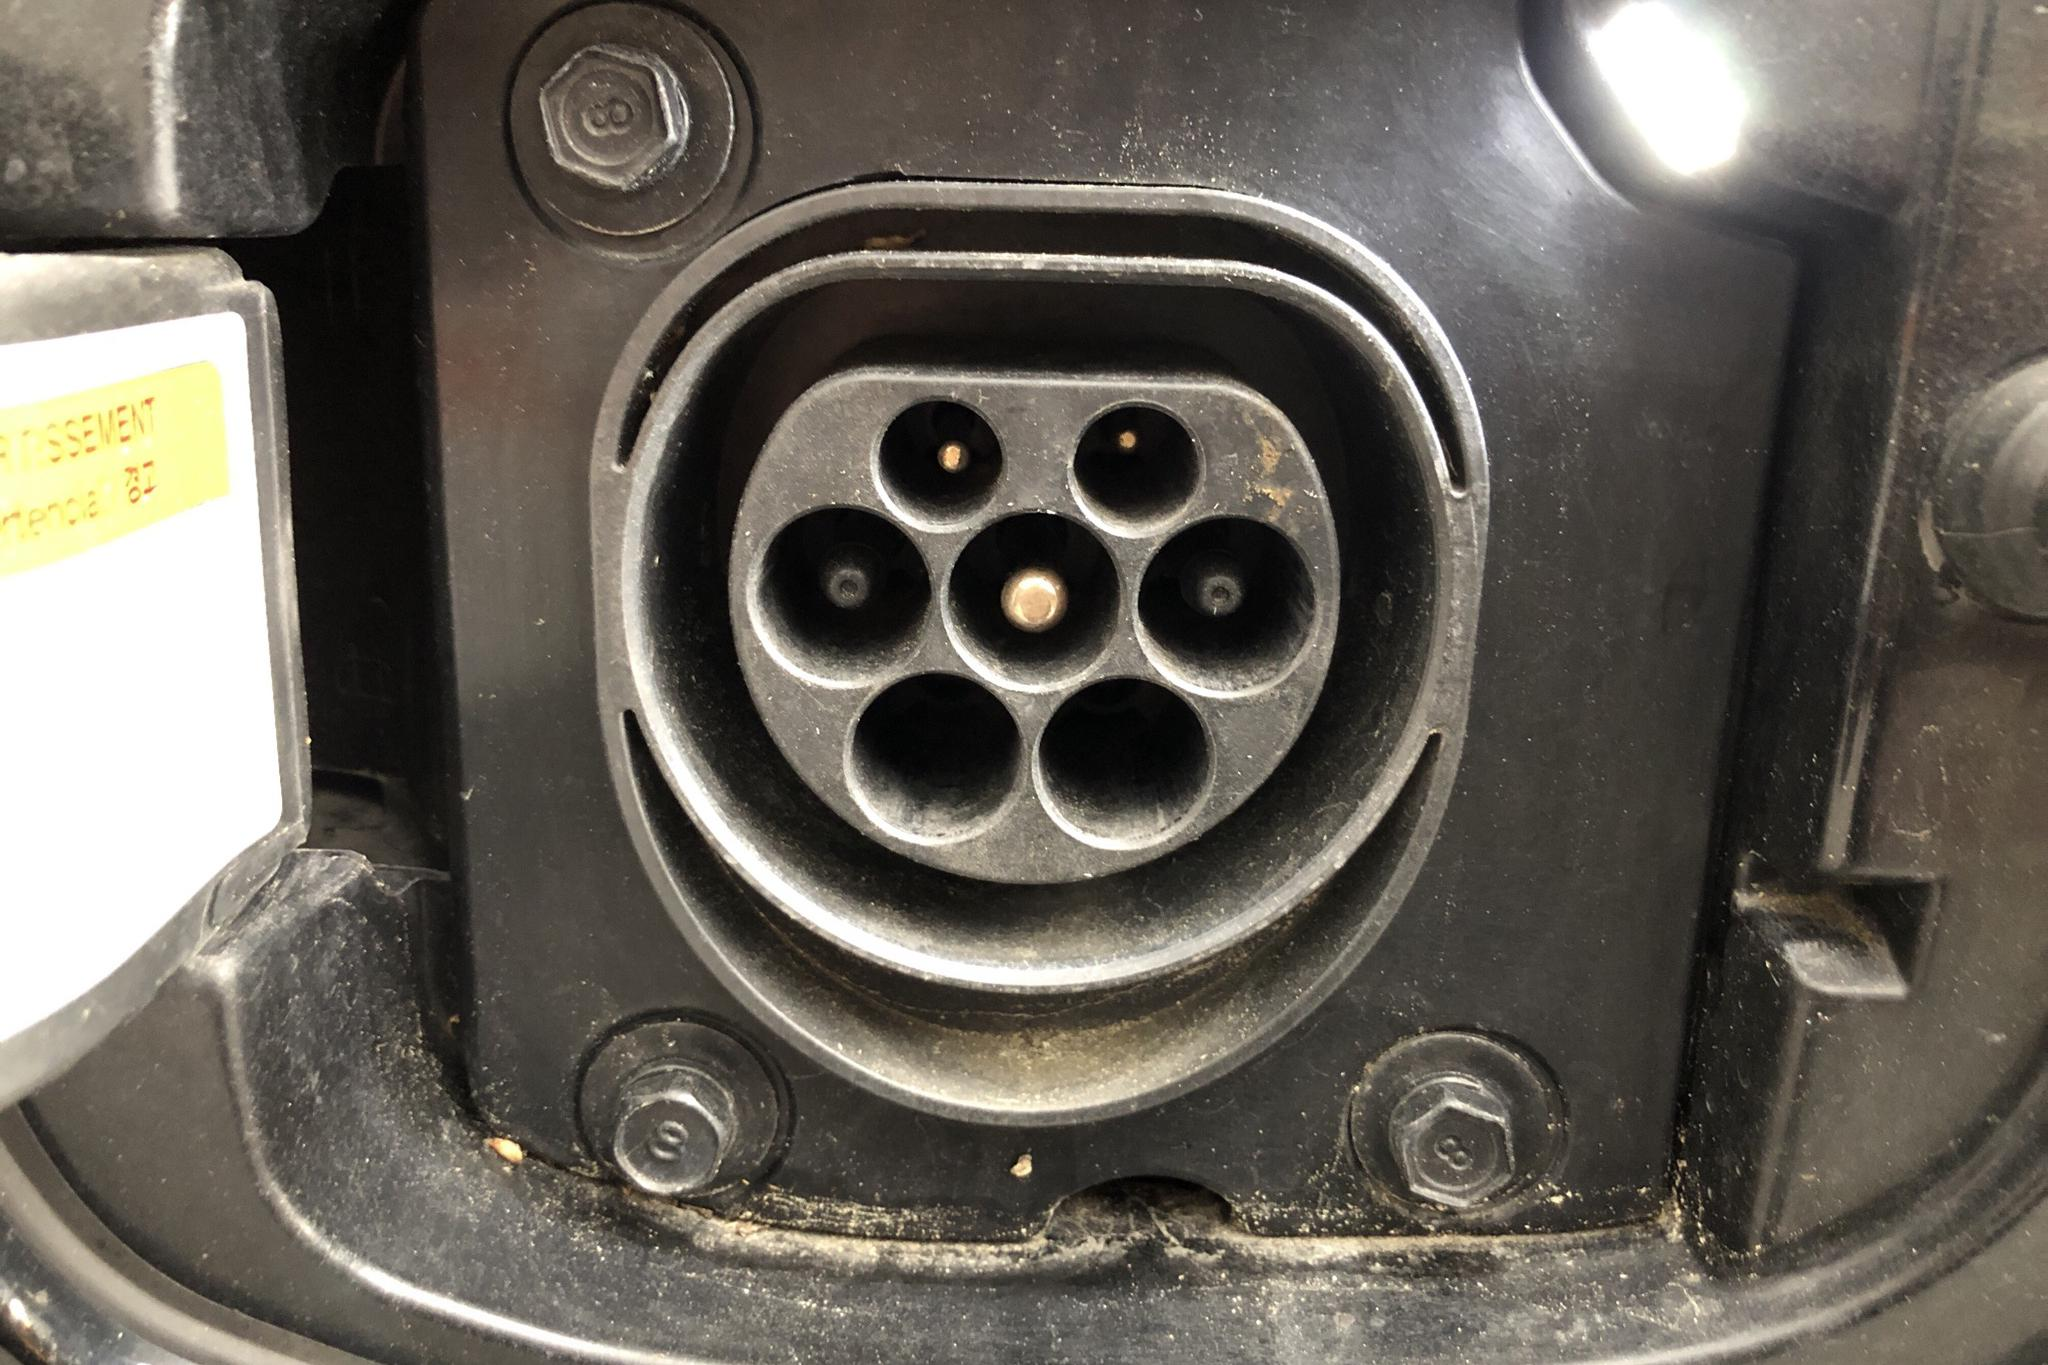 KIA Niro Plug-in Hybrid 1.6 (141hk) - 7 546 mil - Automat - svart - 2018